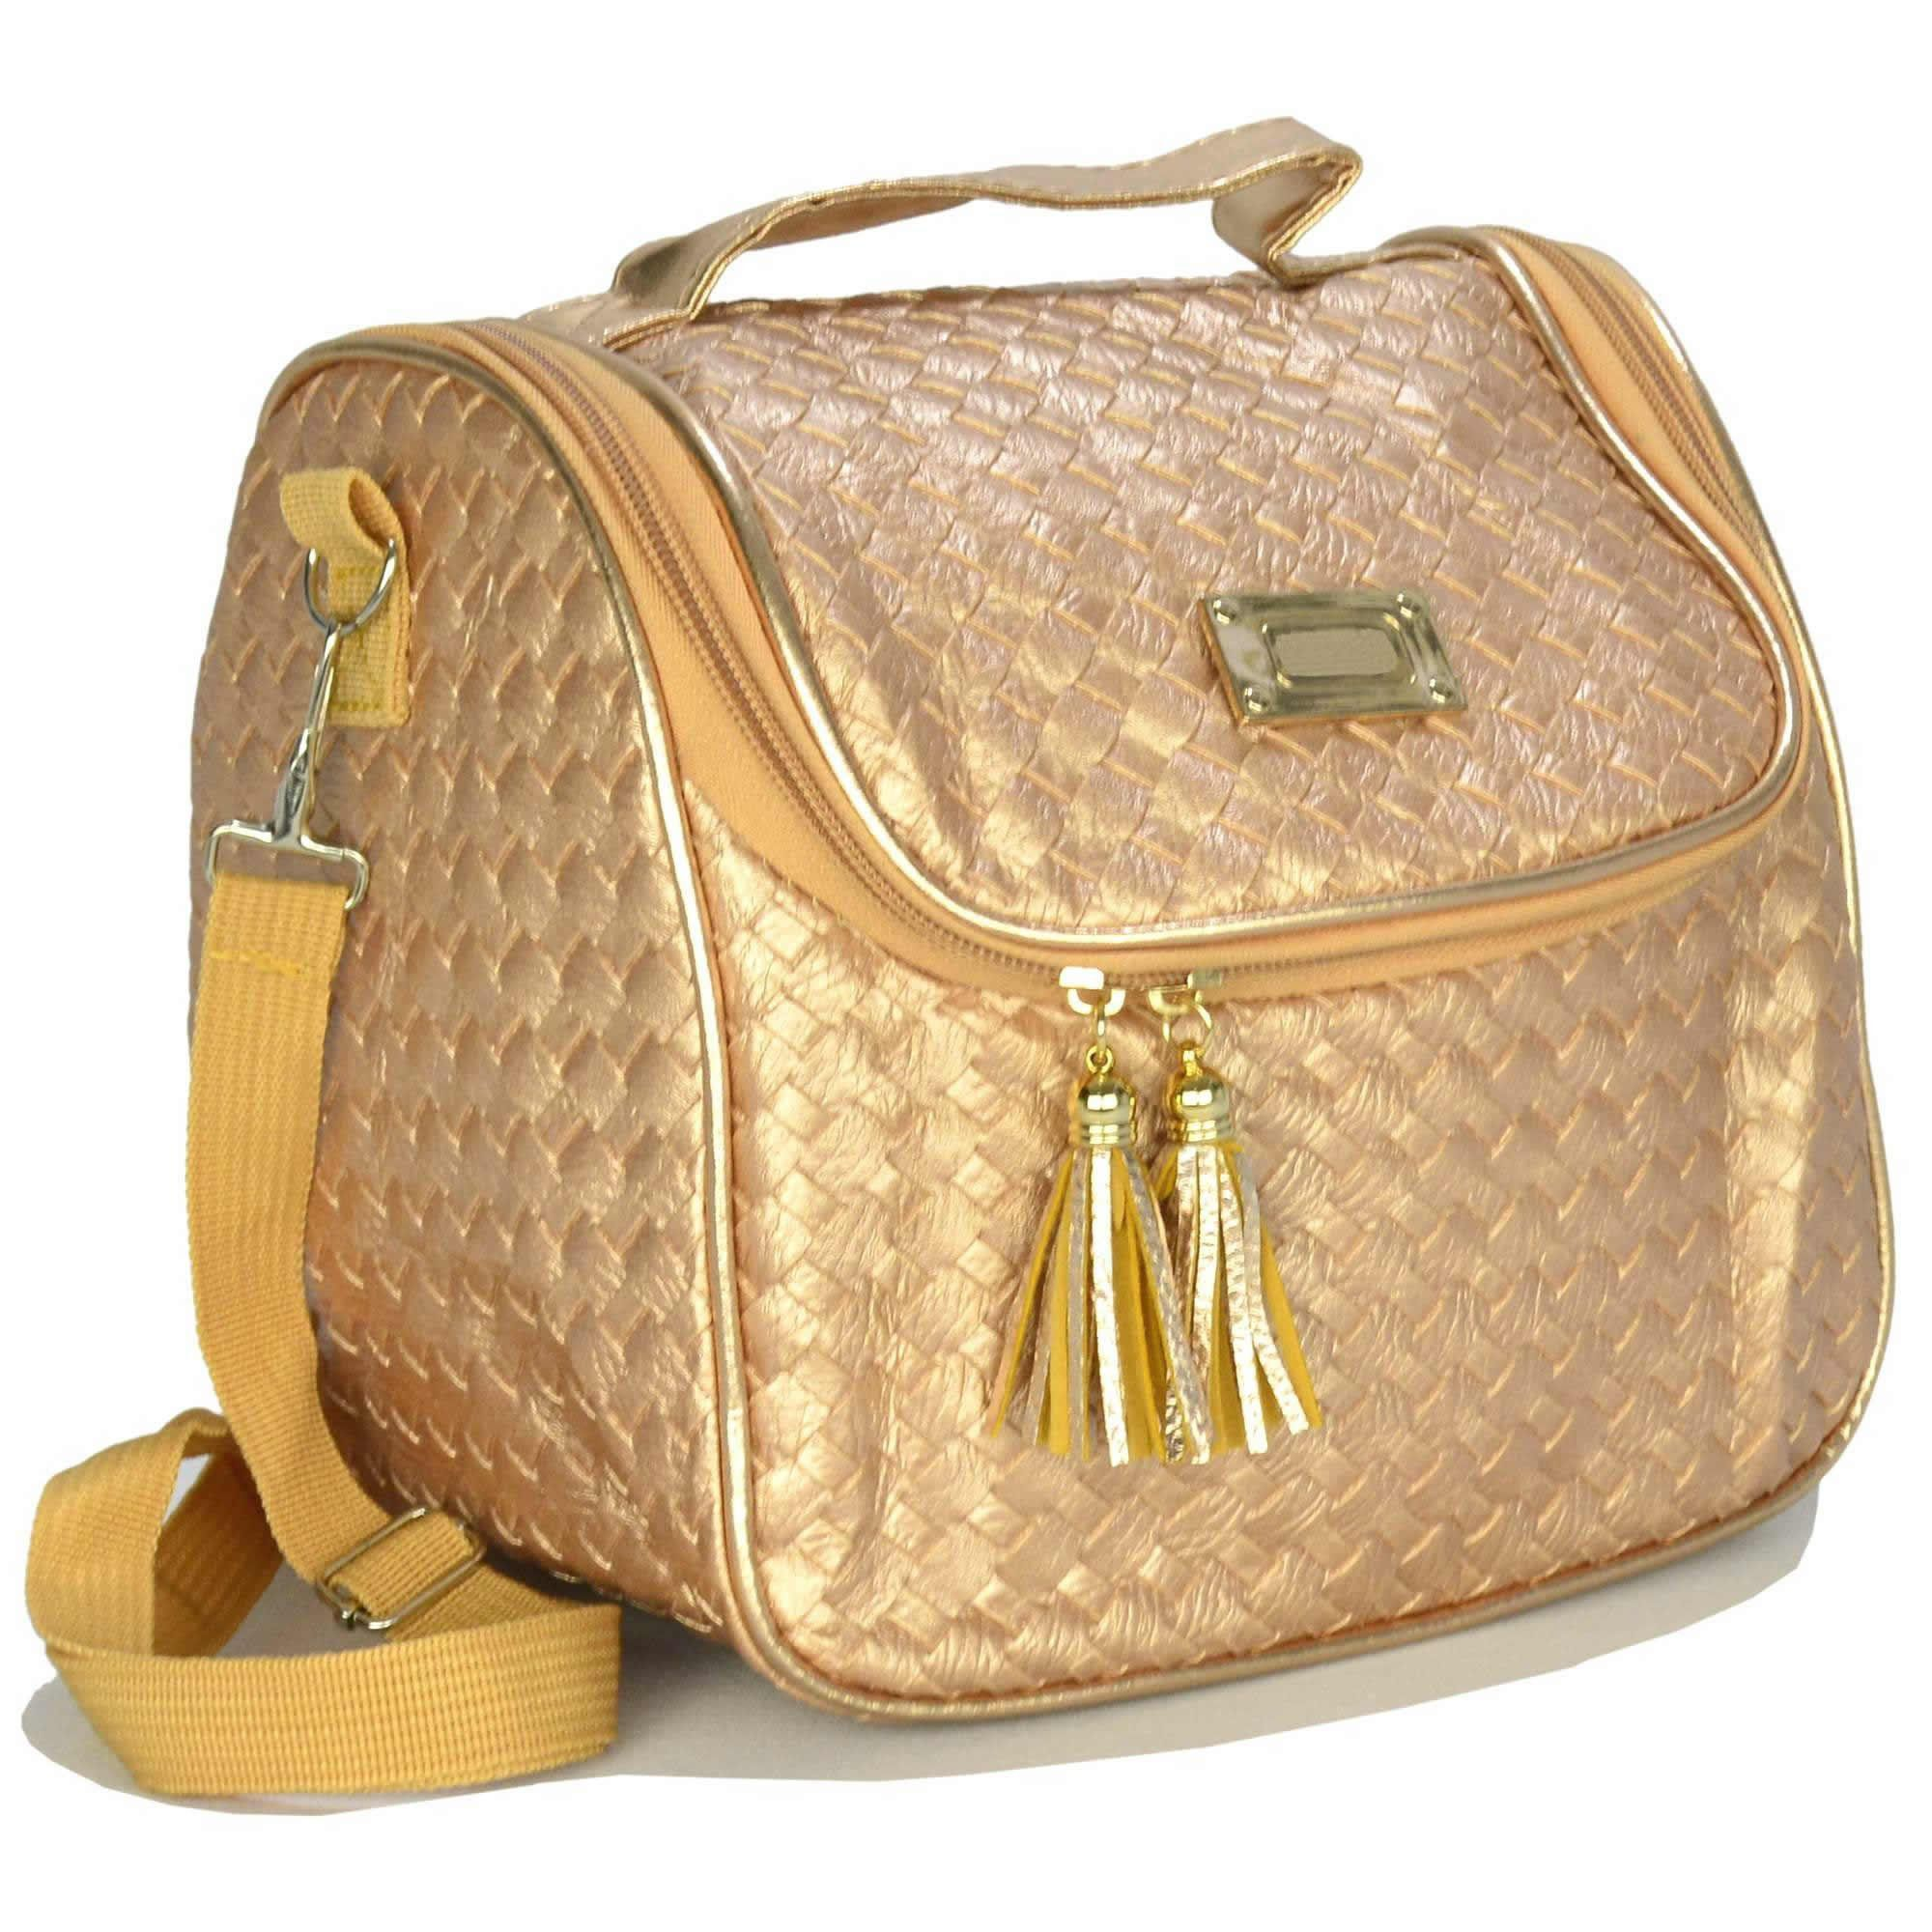 Nécessaire Feminina Bolsa Térmica Luxo Dourado CBRN07967